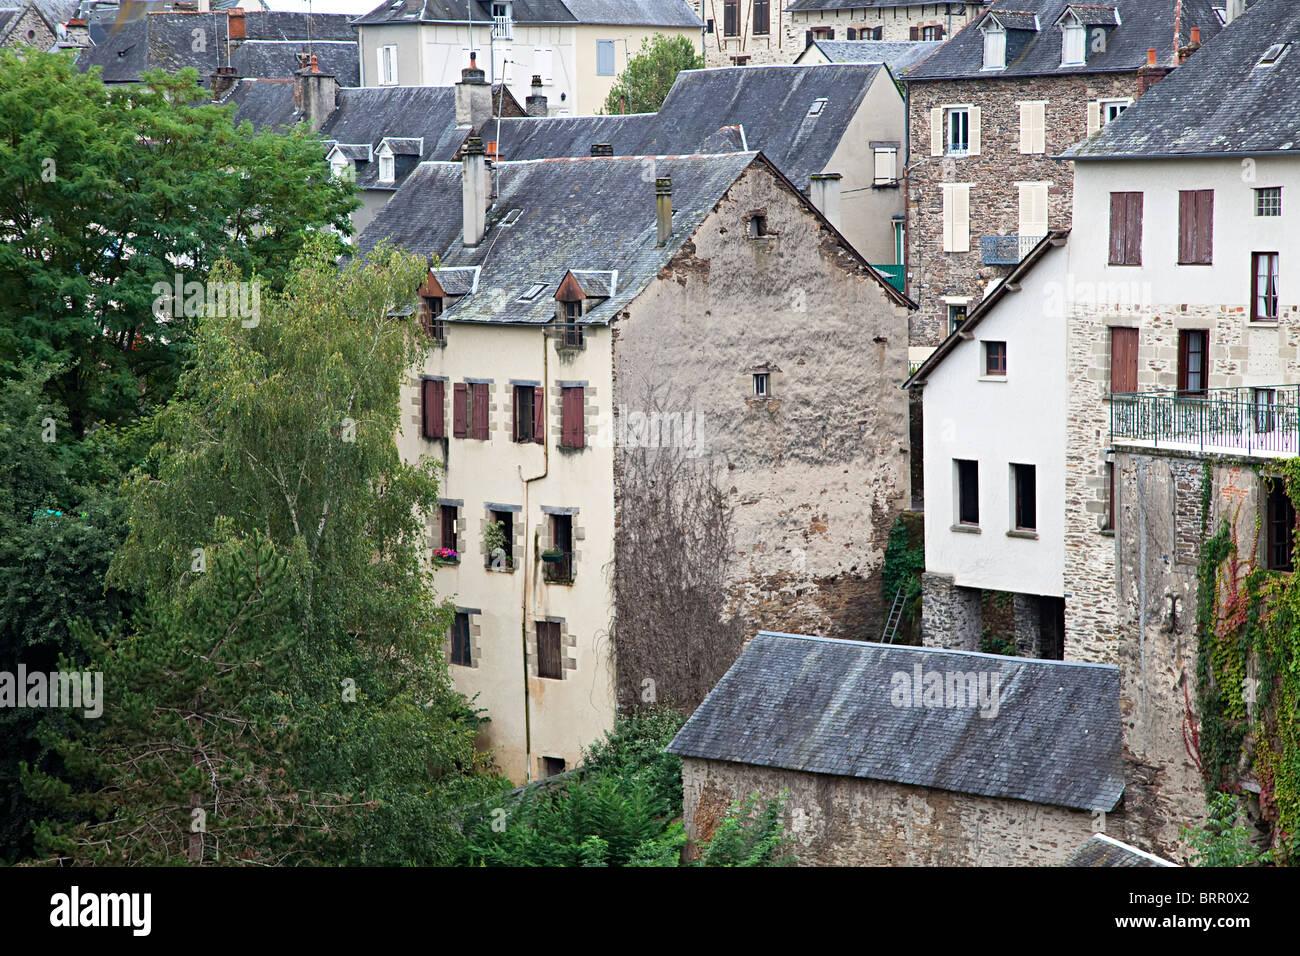 Houses in Donzenac Corrèze France - Stock Image